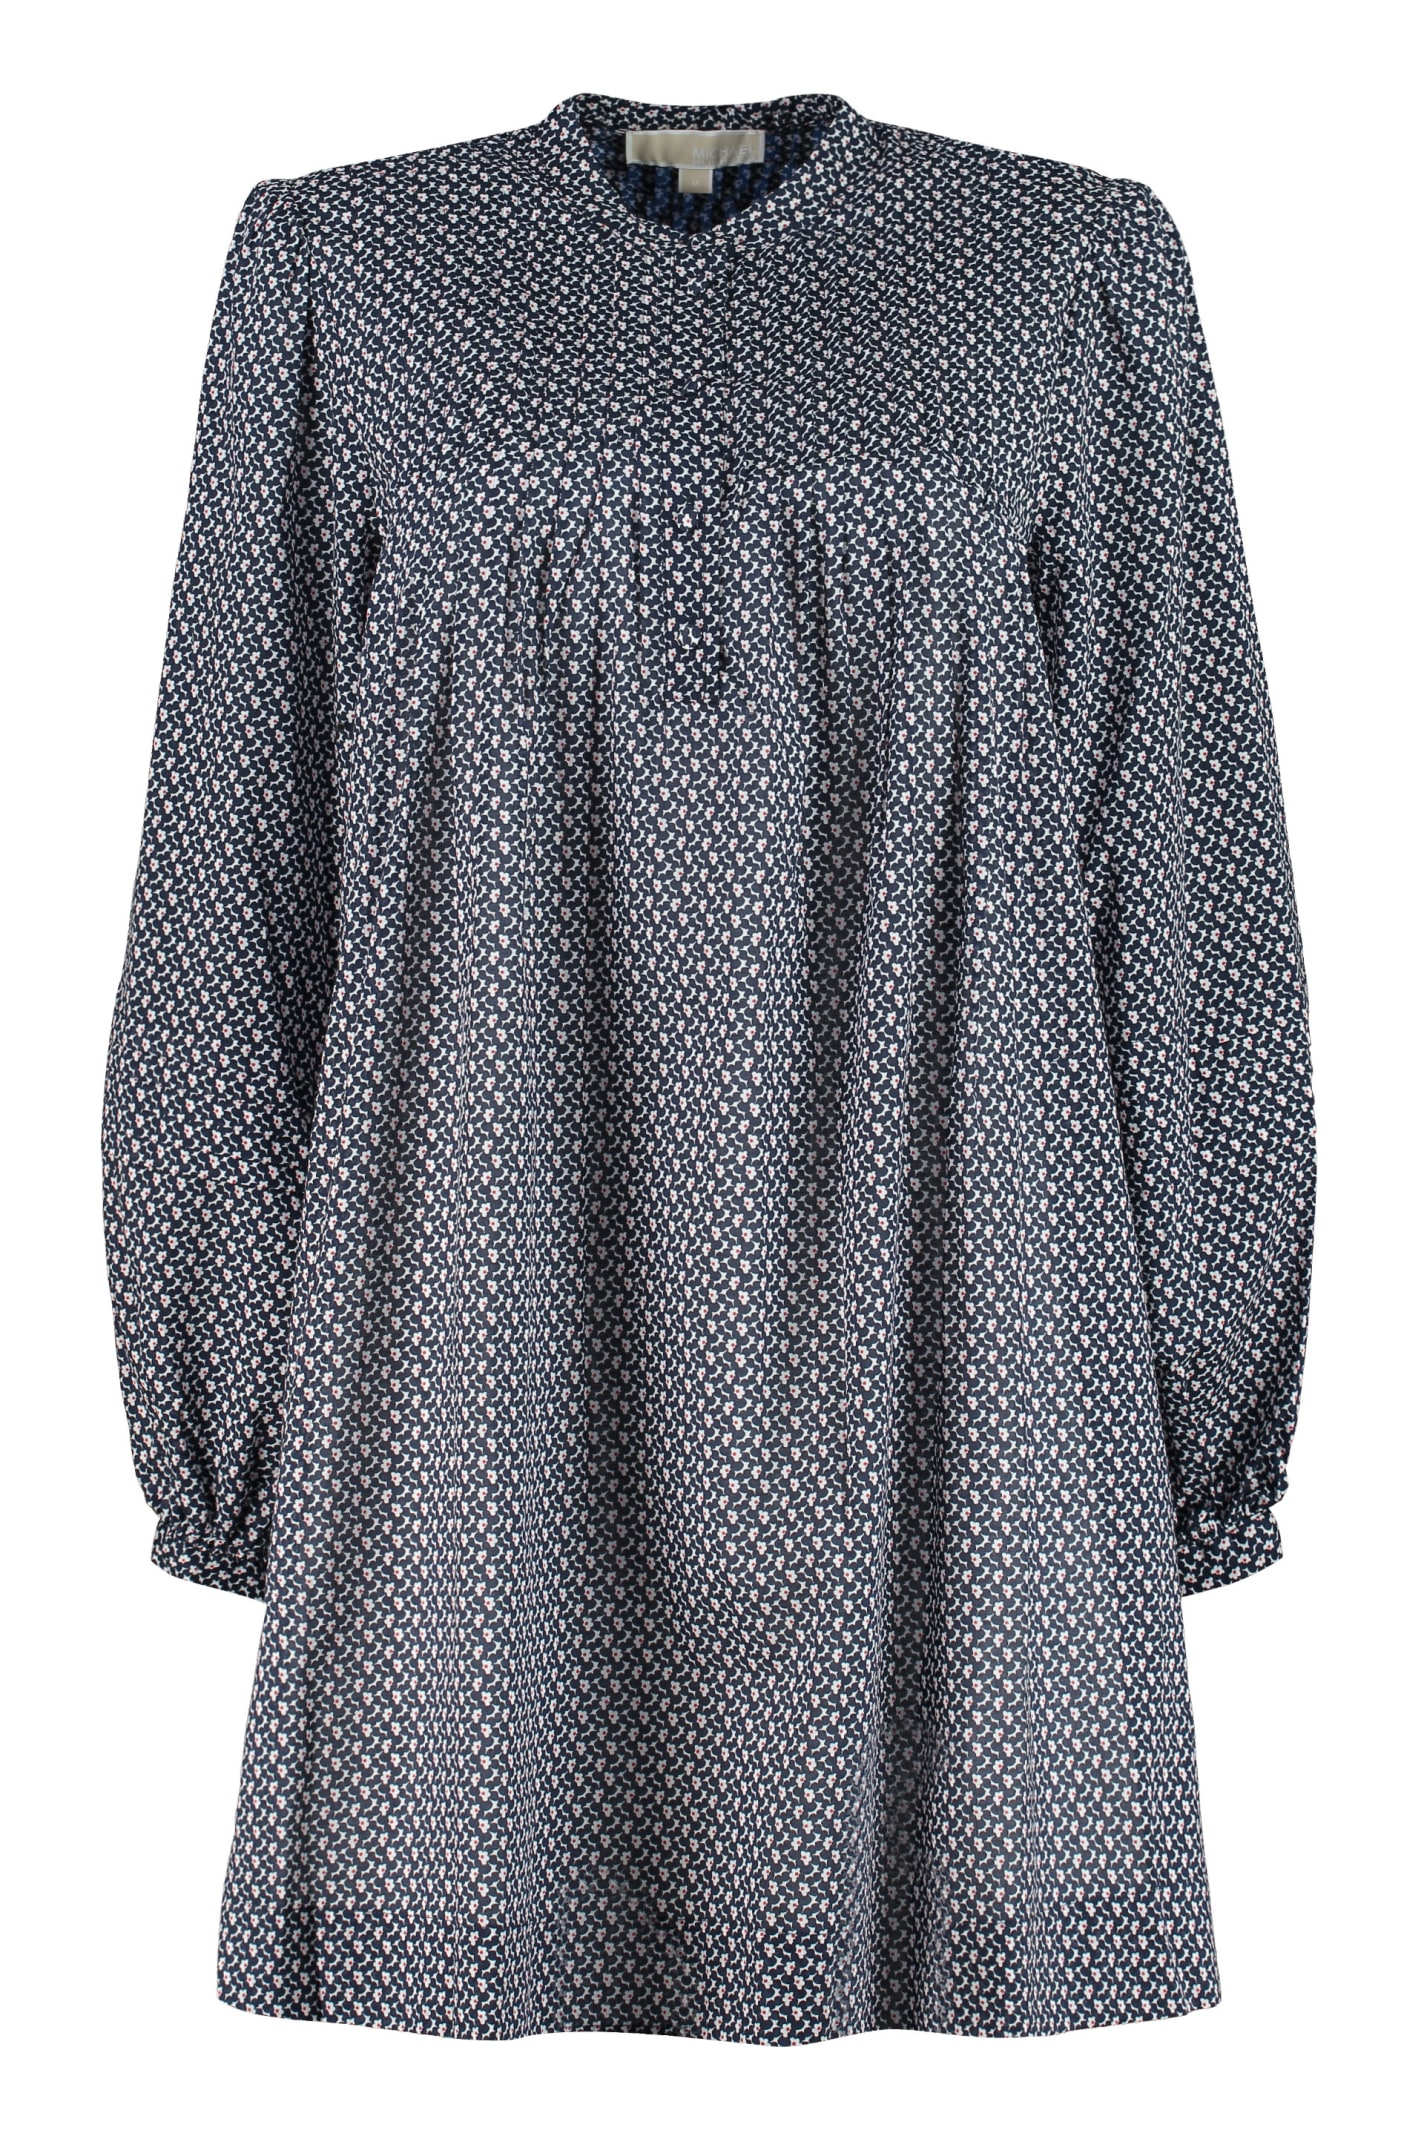 MICHAEL Michael Kors Printed Cotton Dress